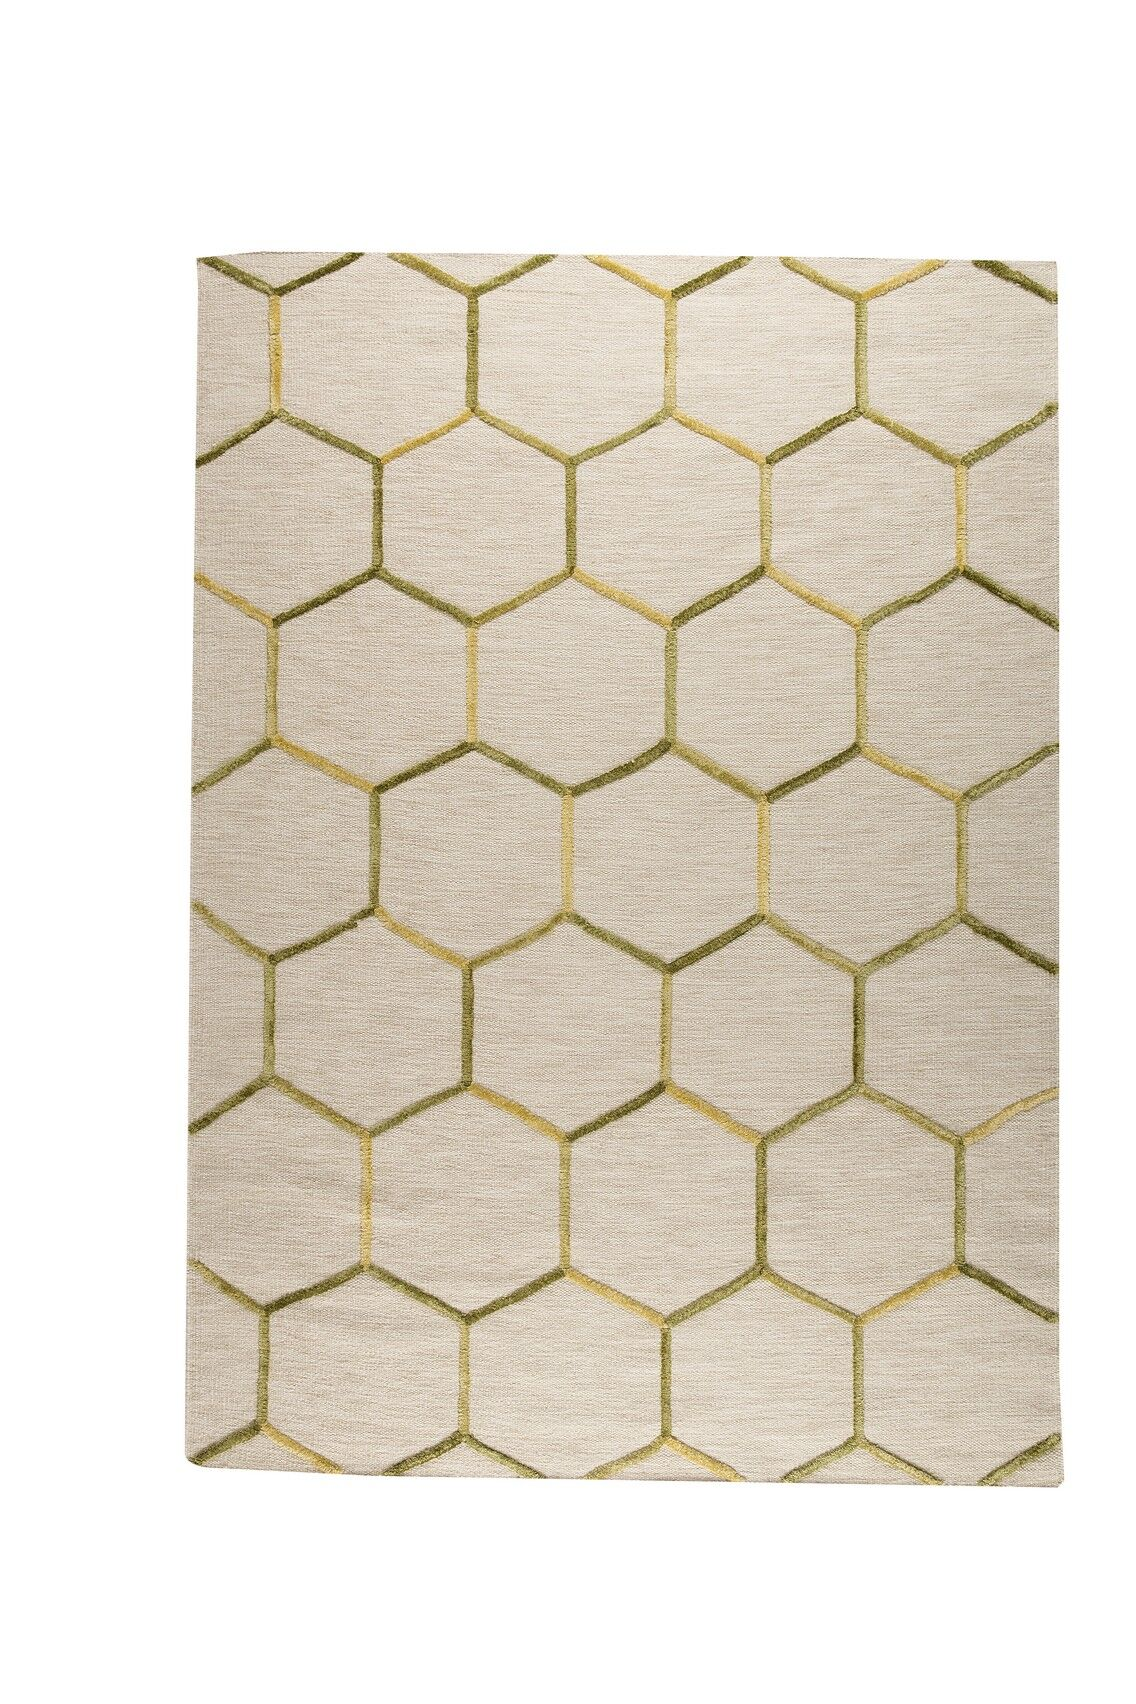 Khema 2 Hand-Woven Green/Gold Area Rug Rug Size: 5'6